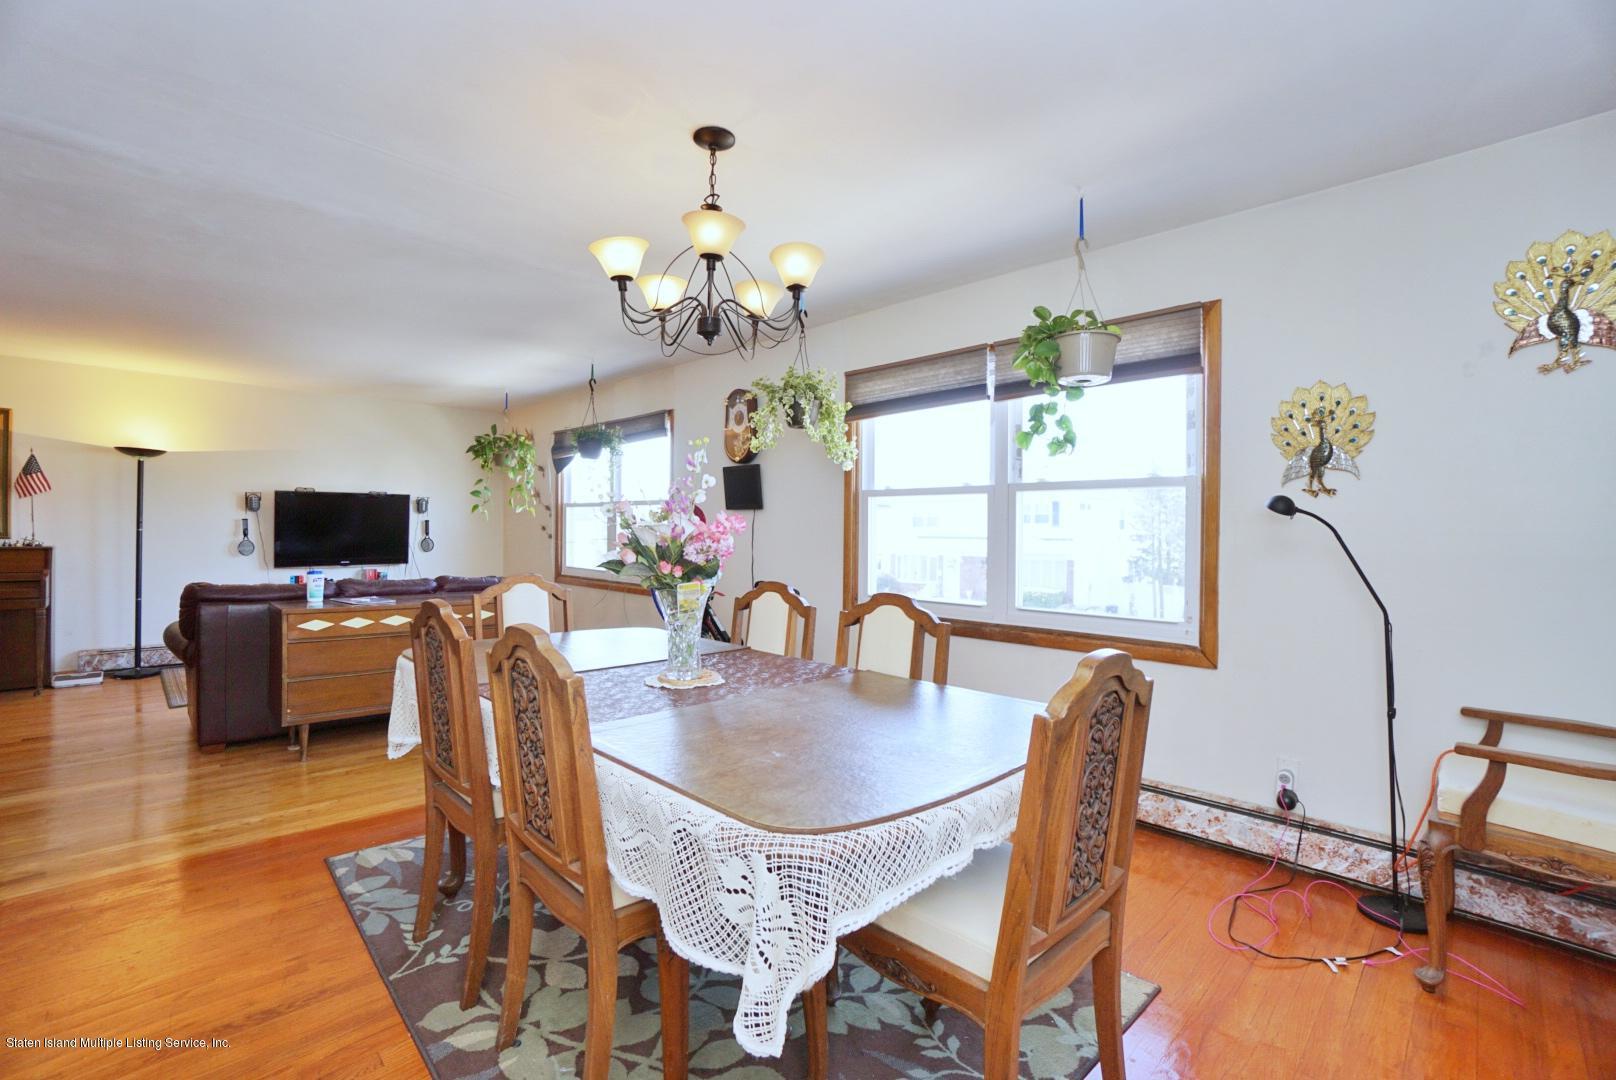 Single Family - Detached 495 Winchester Avenue  Staten Island, NY 10312, MLS-1136561-12